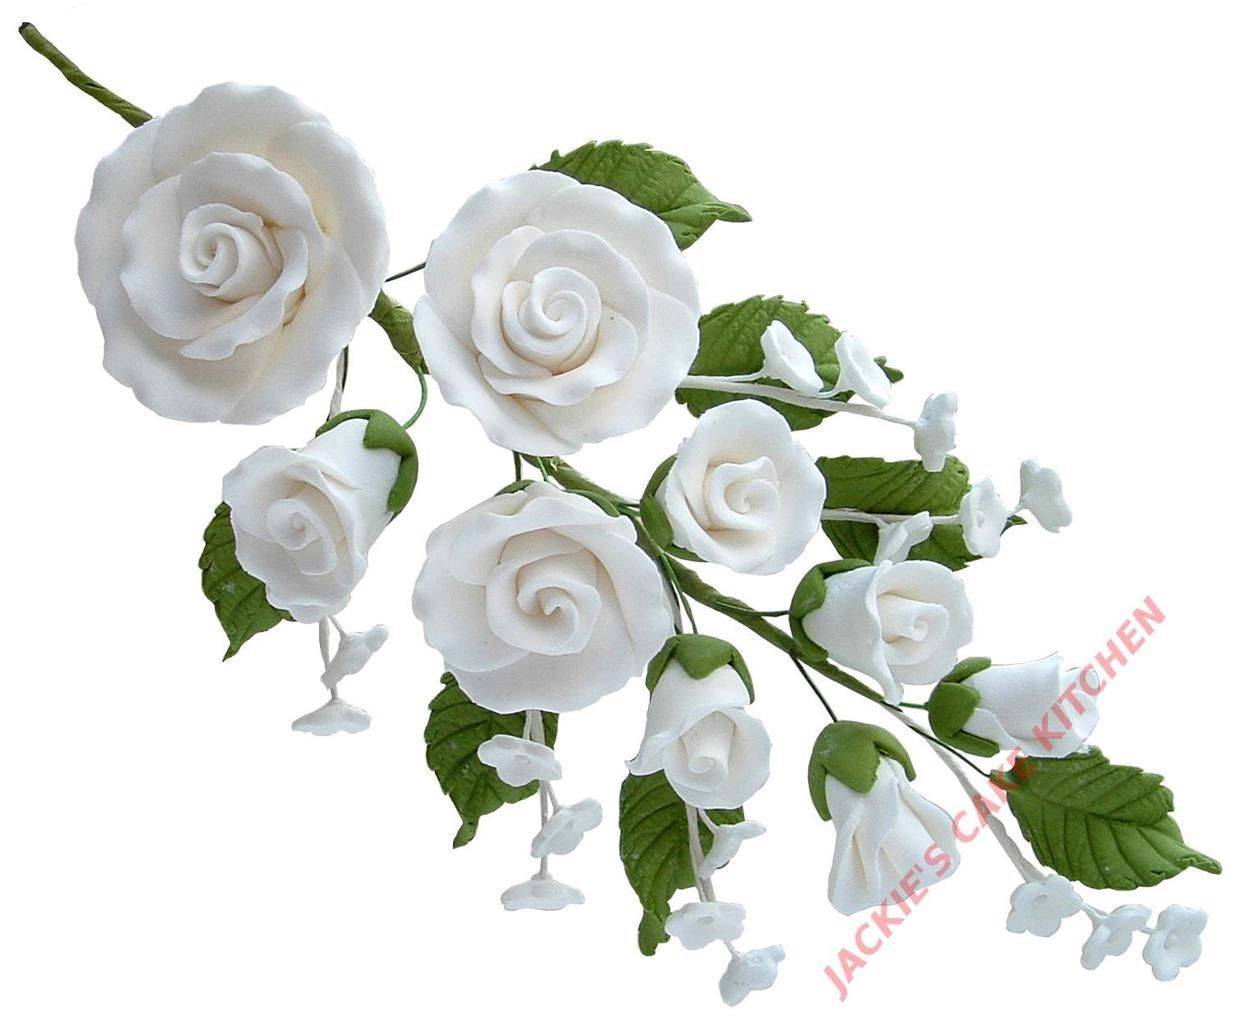 Large Medium Small Xs Sugar Rose Spray Bouquet Wedding Cake Topper